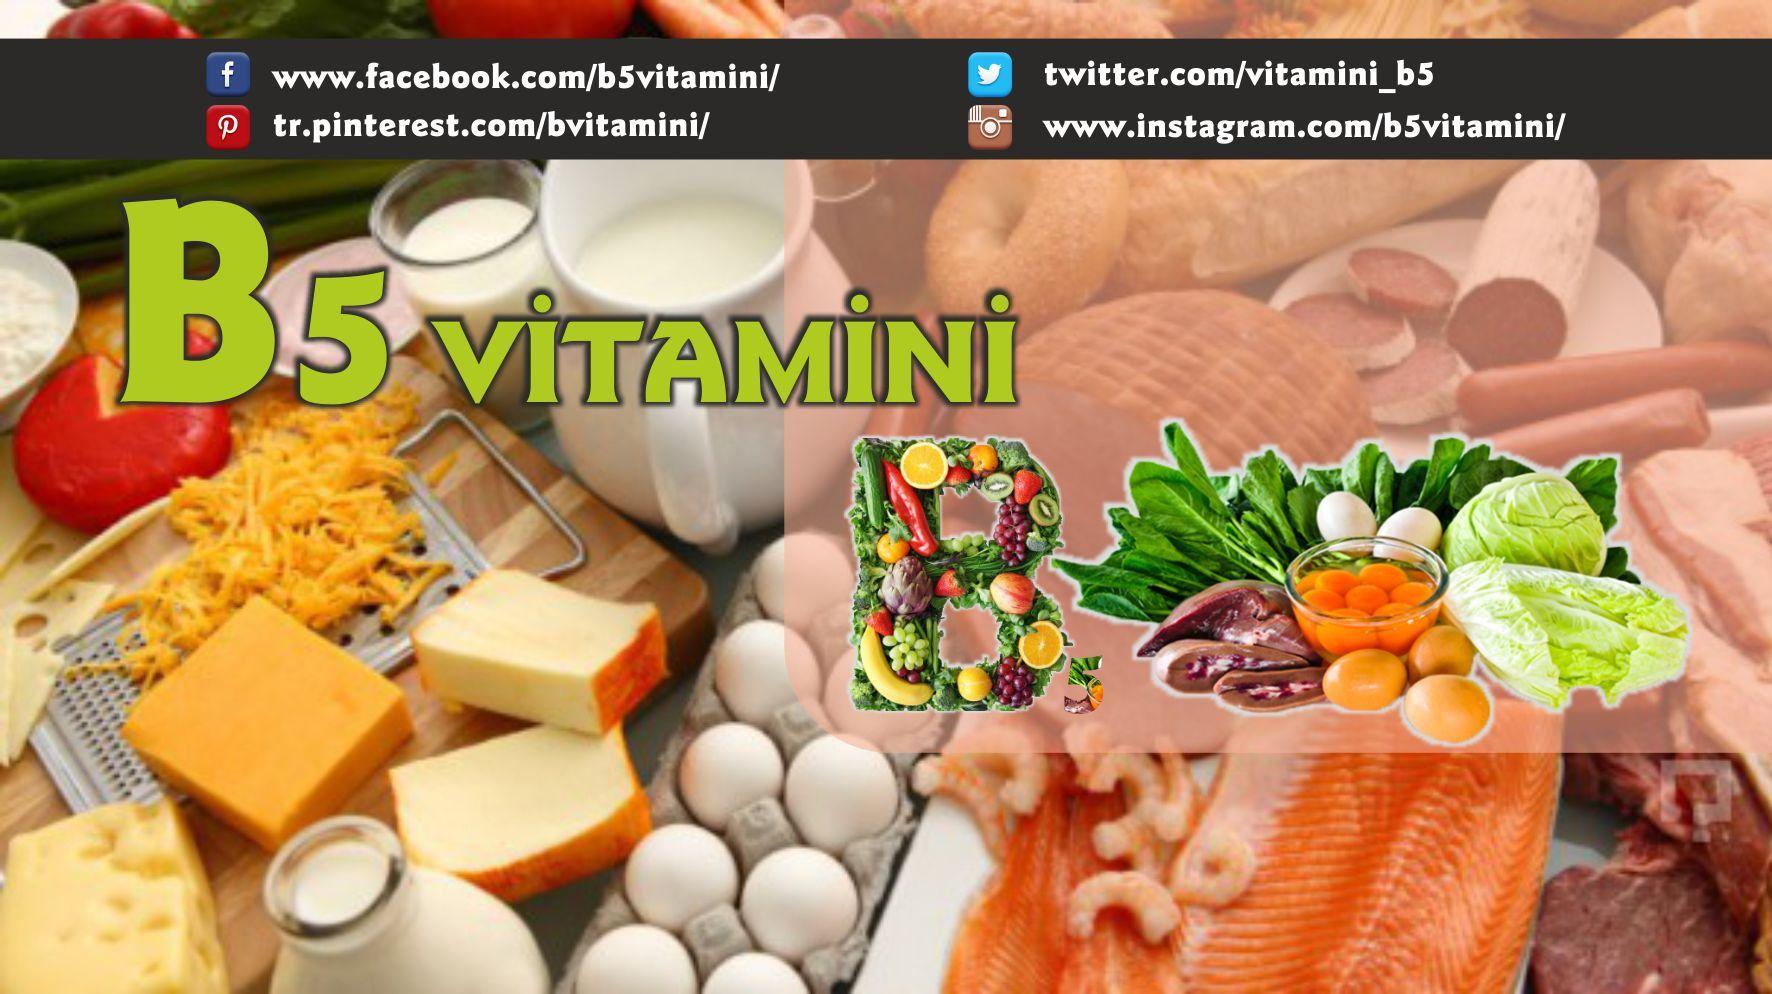 U vitamininin faydaları nelerdir